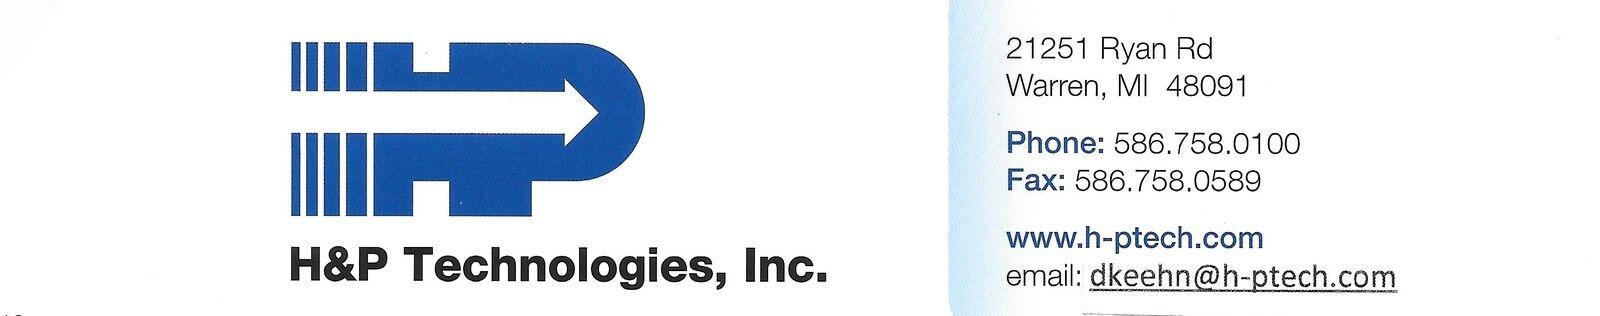 H&P Technologies inc